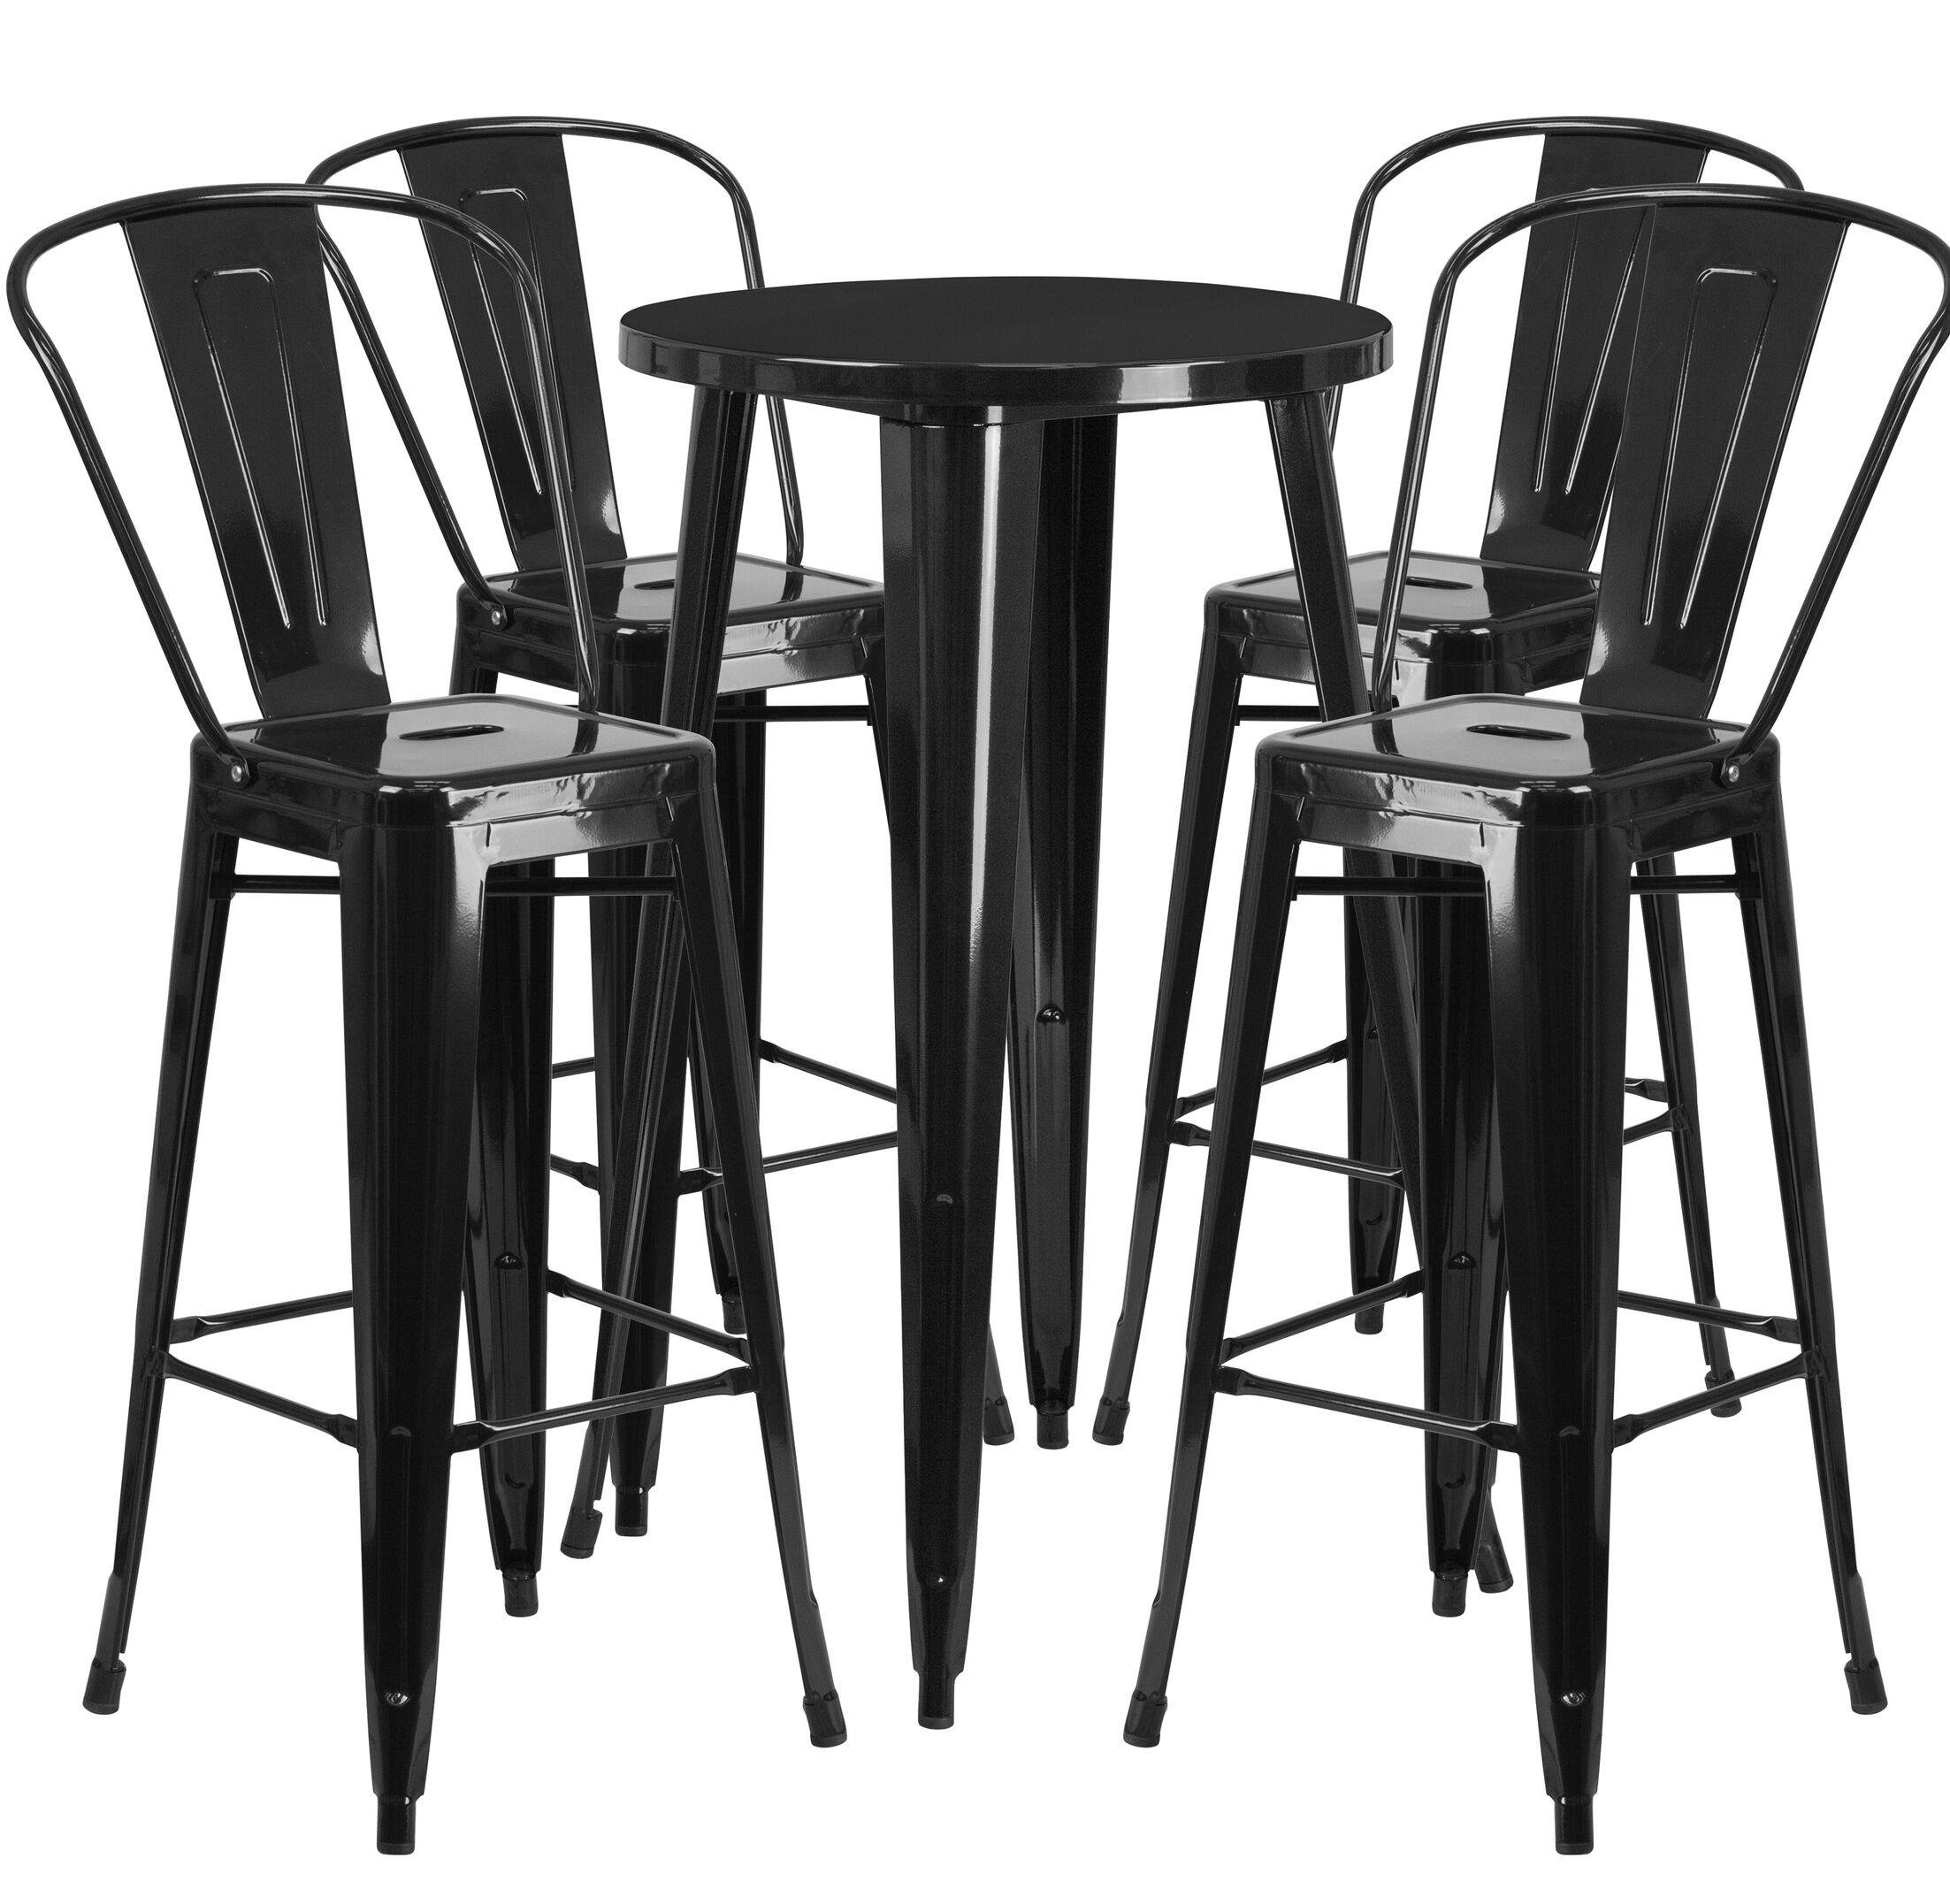 Williamston 5 Piece Bar Height Dining Set Finish: Black